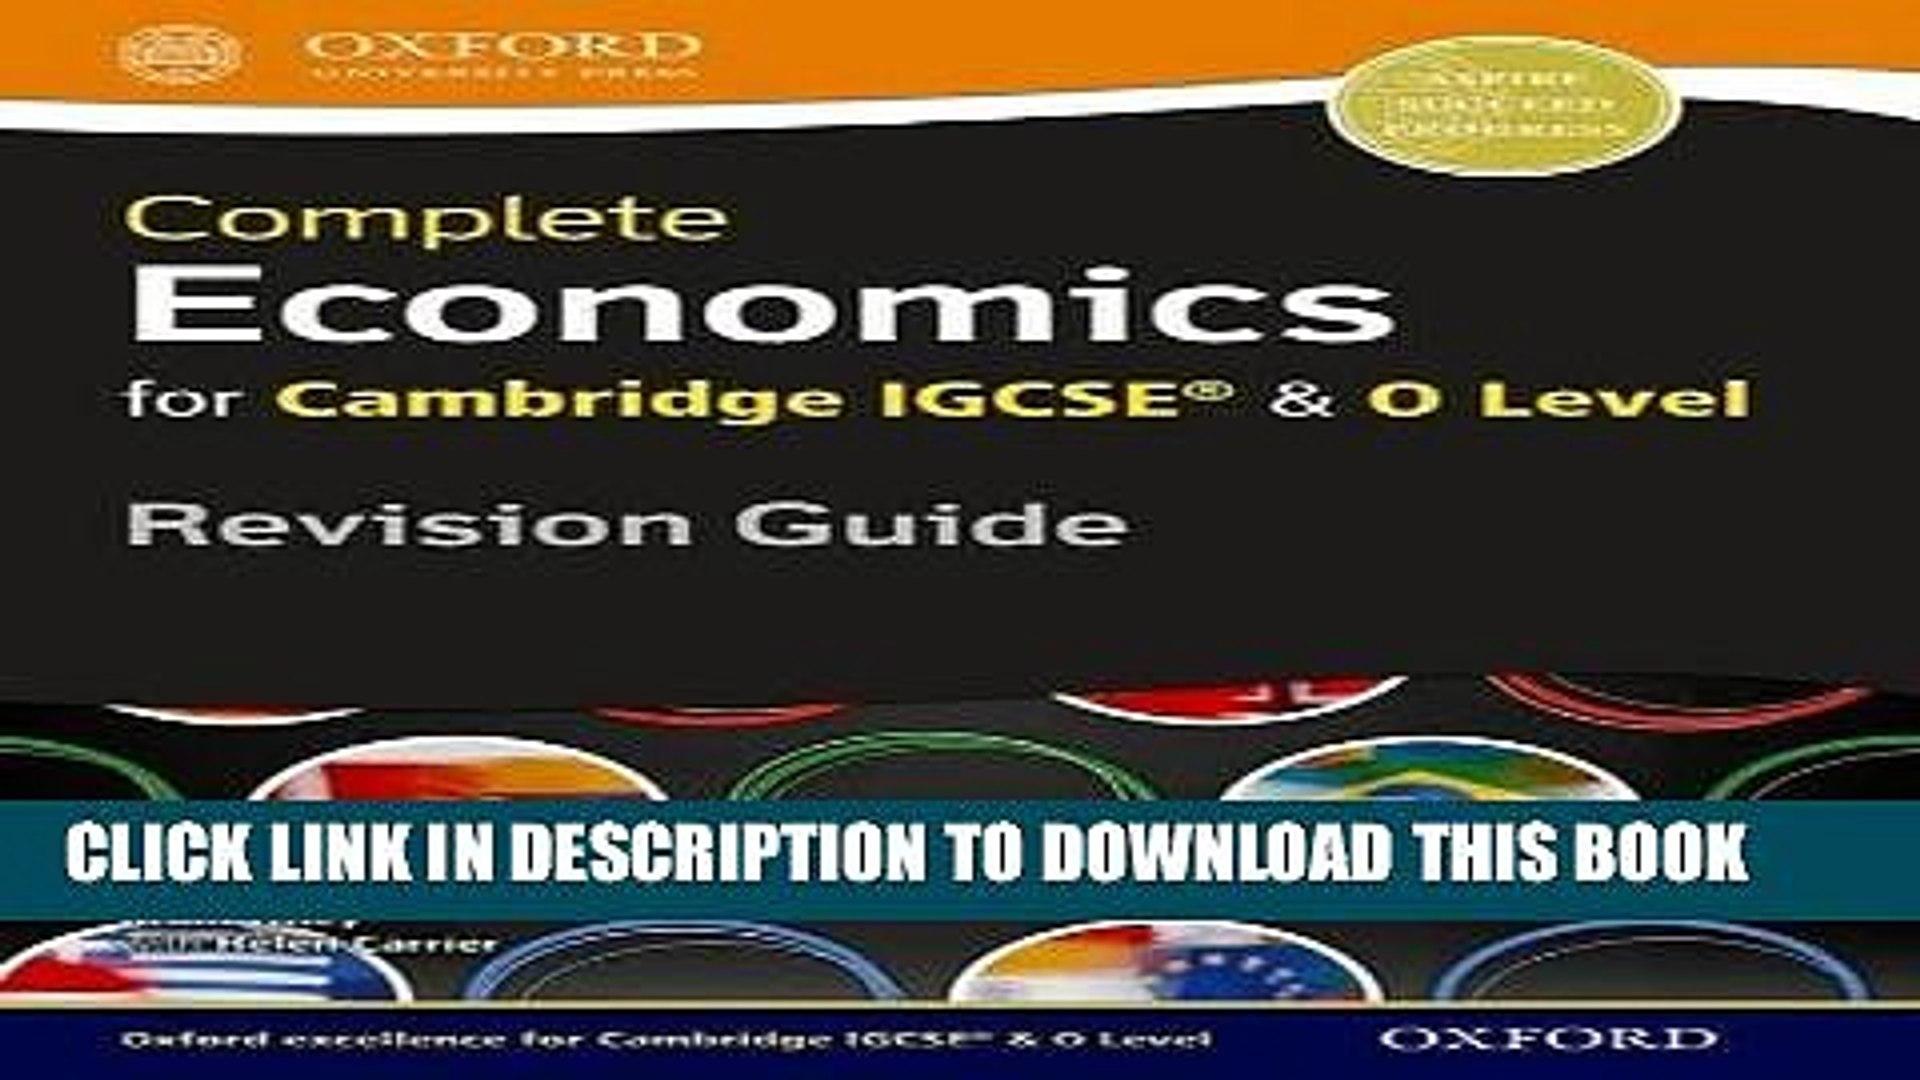 Ebook Economics for Cambridge IGCSERG and O Level Revision Guide (Igcse O  Level Revision Guide)